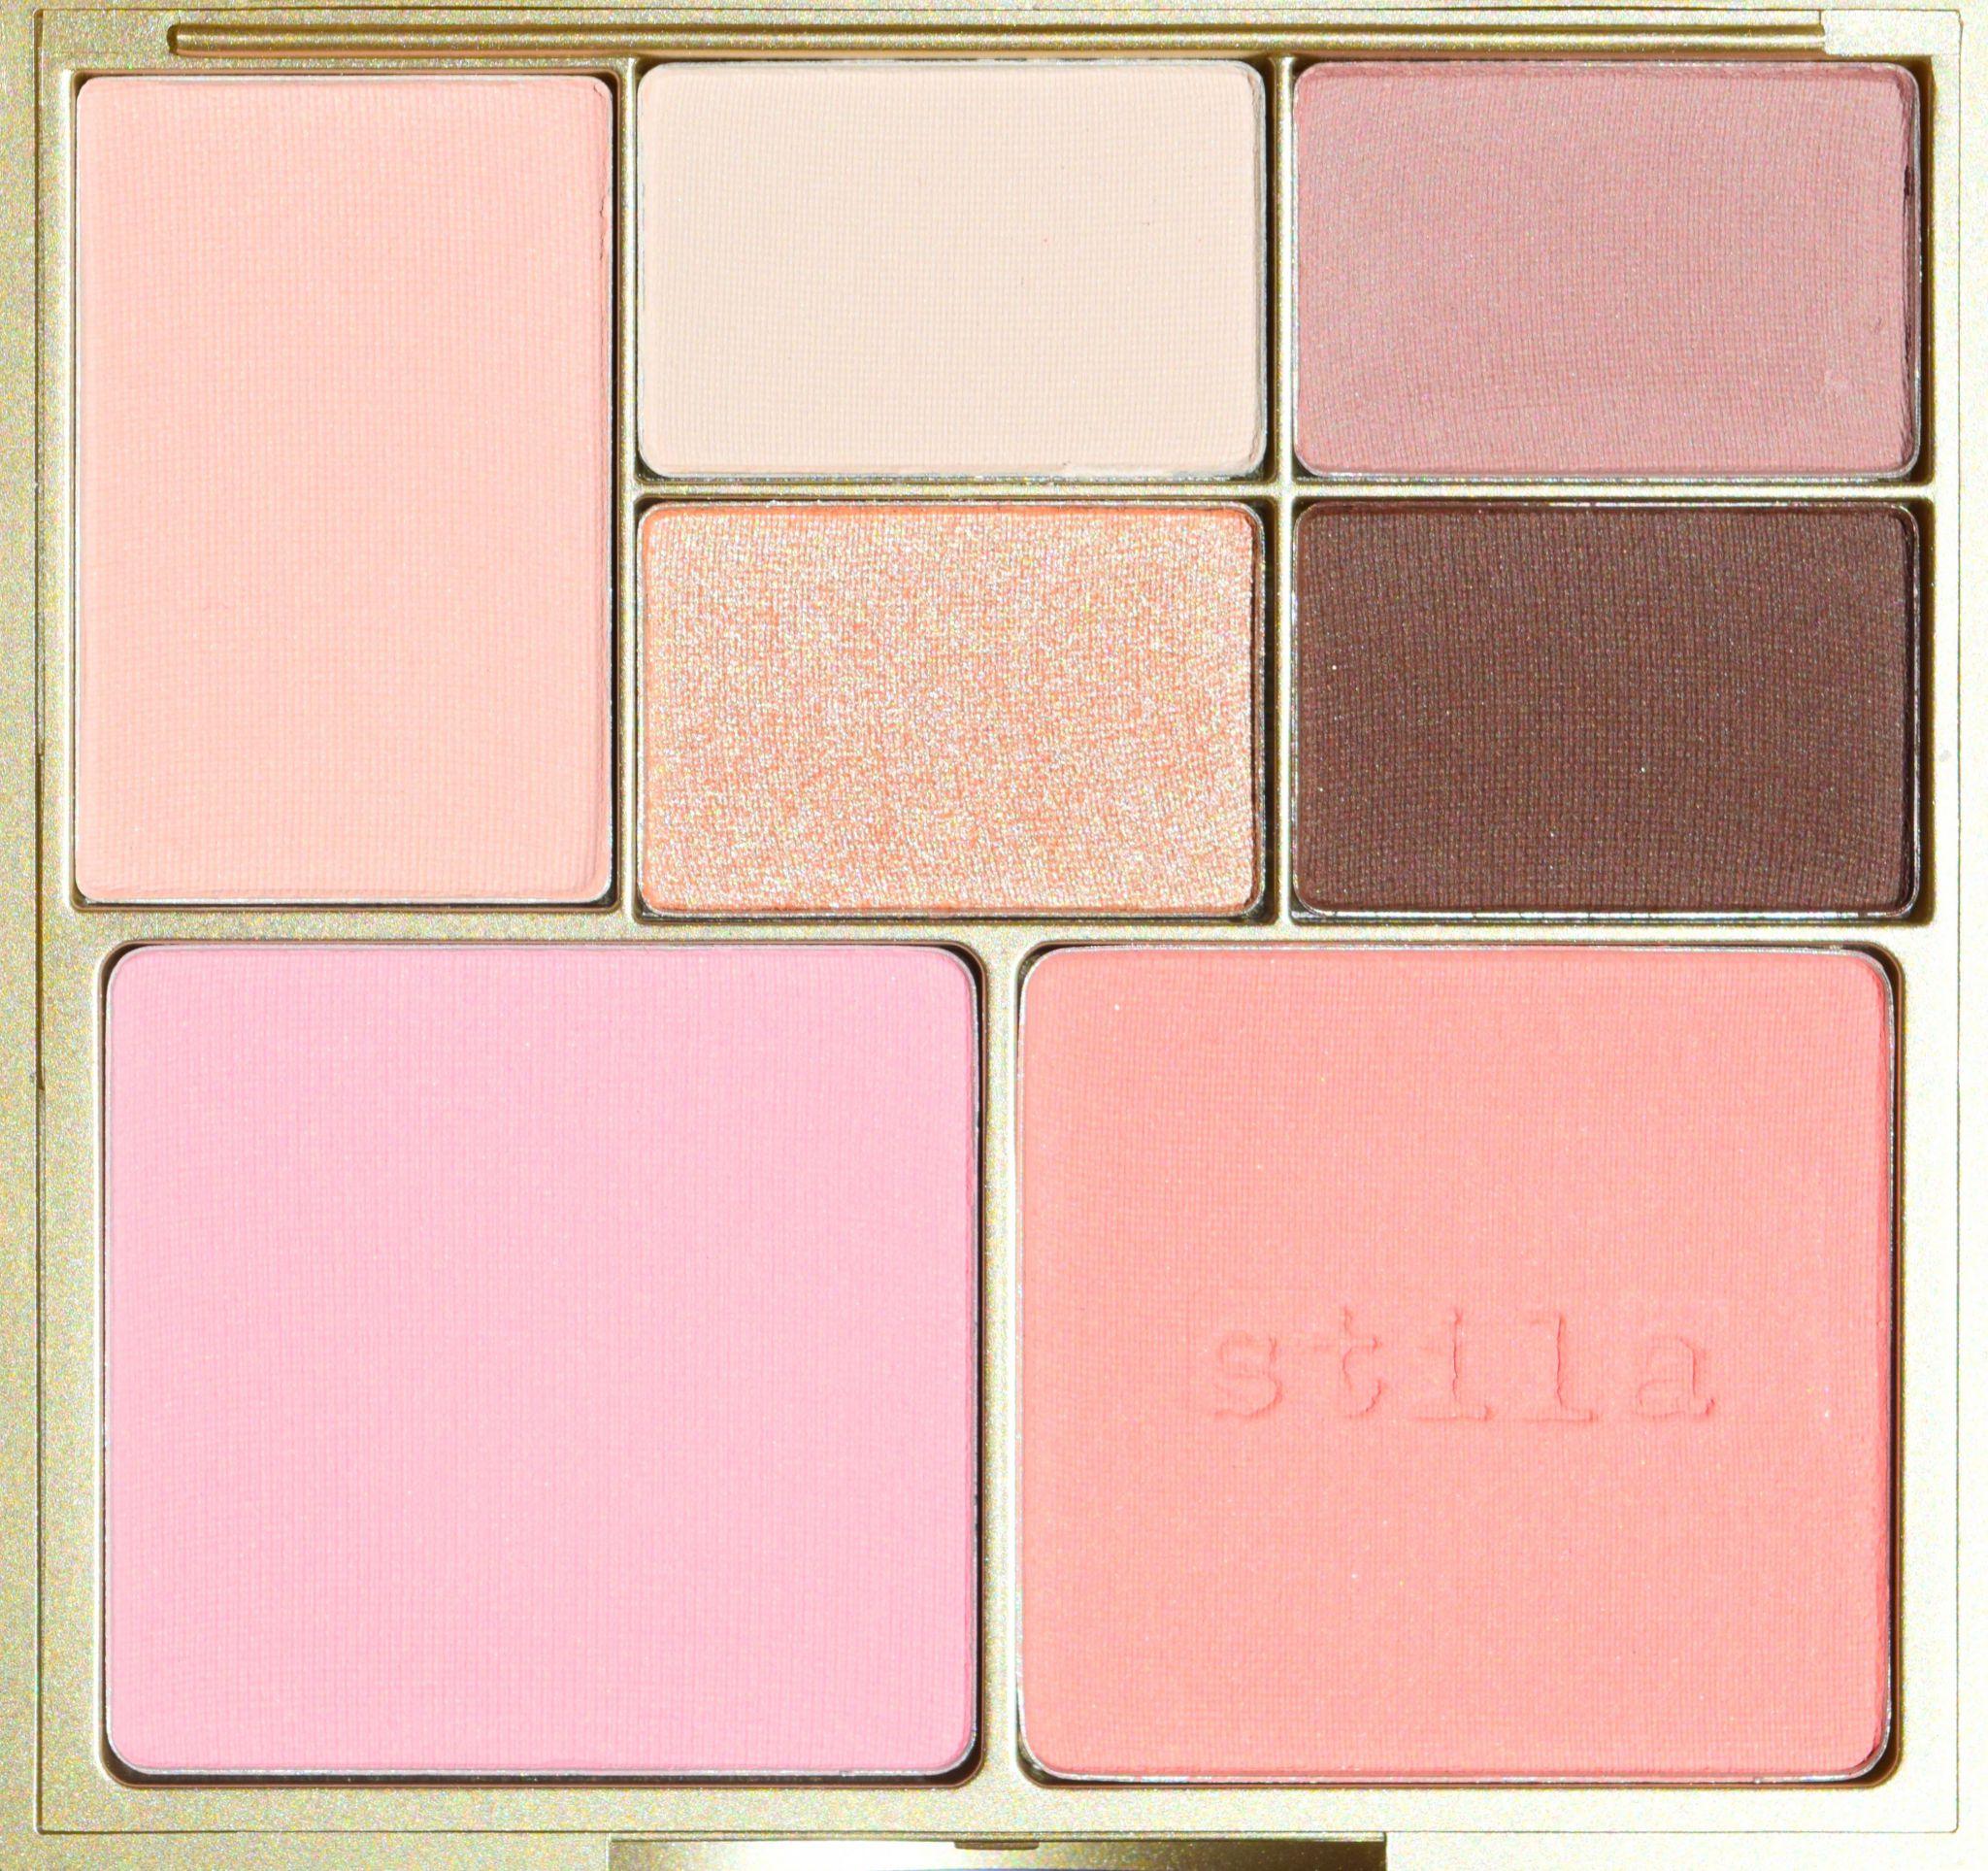 stila-perfect-me-perfect-hue-eye-and-cheek-palette